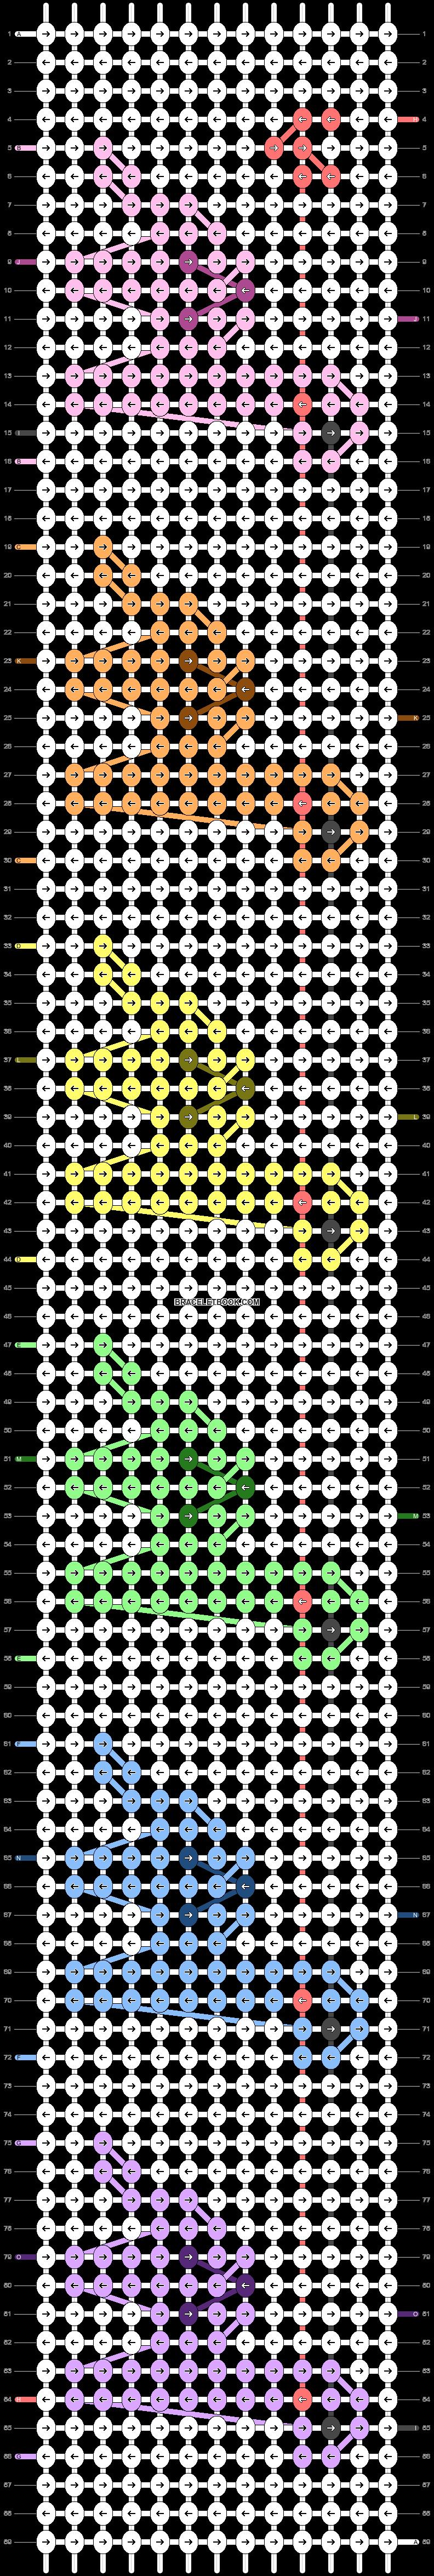 Alpha Pattern #21971 added by kaittogz